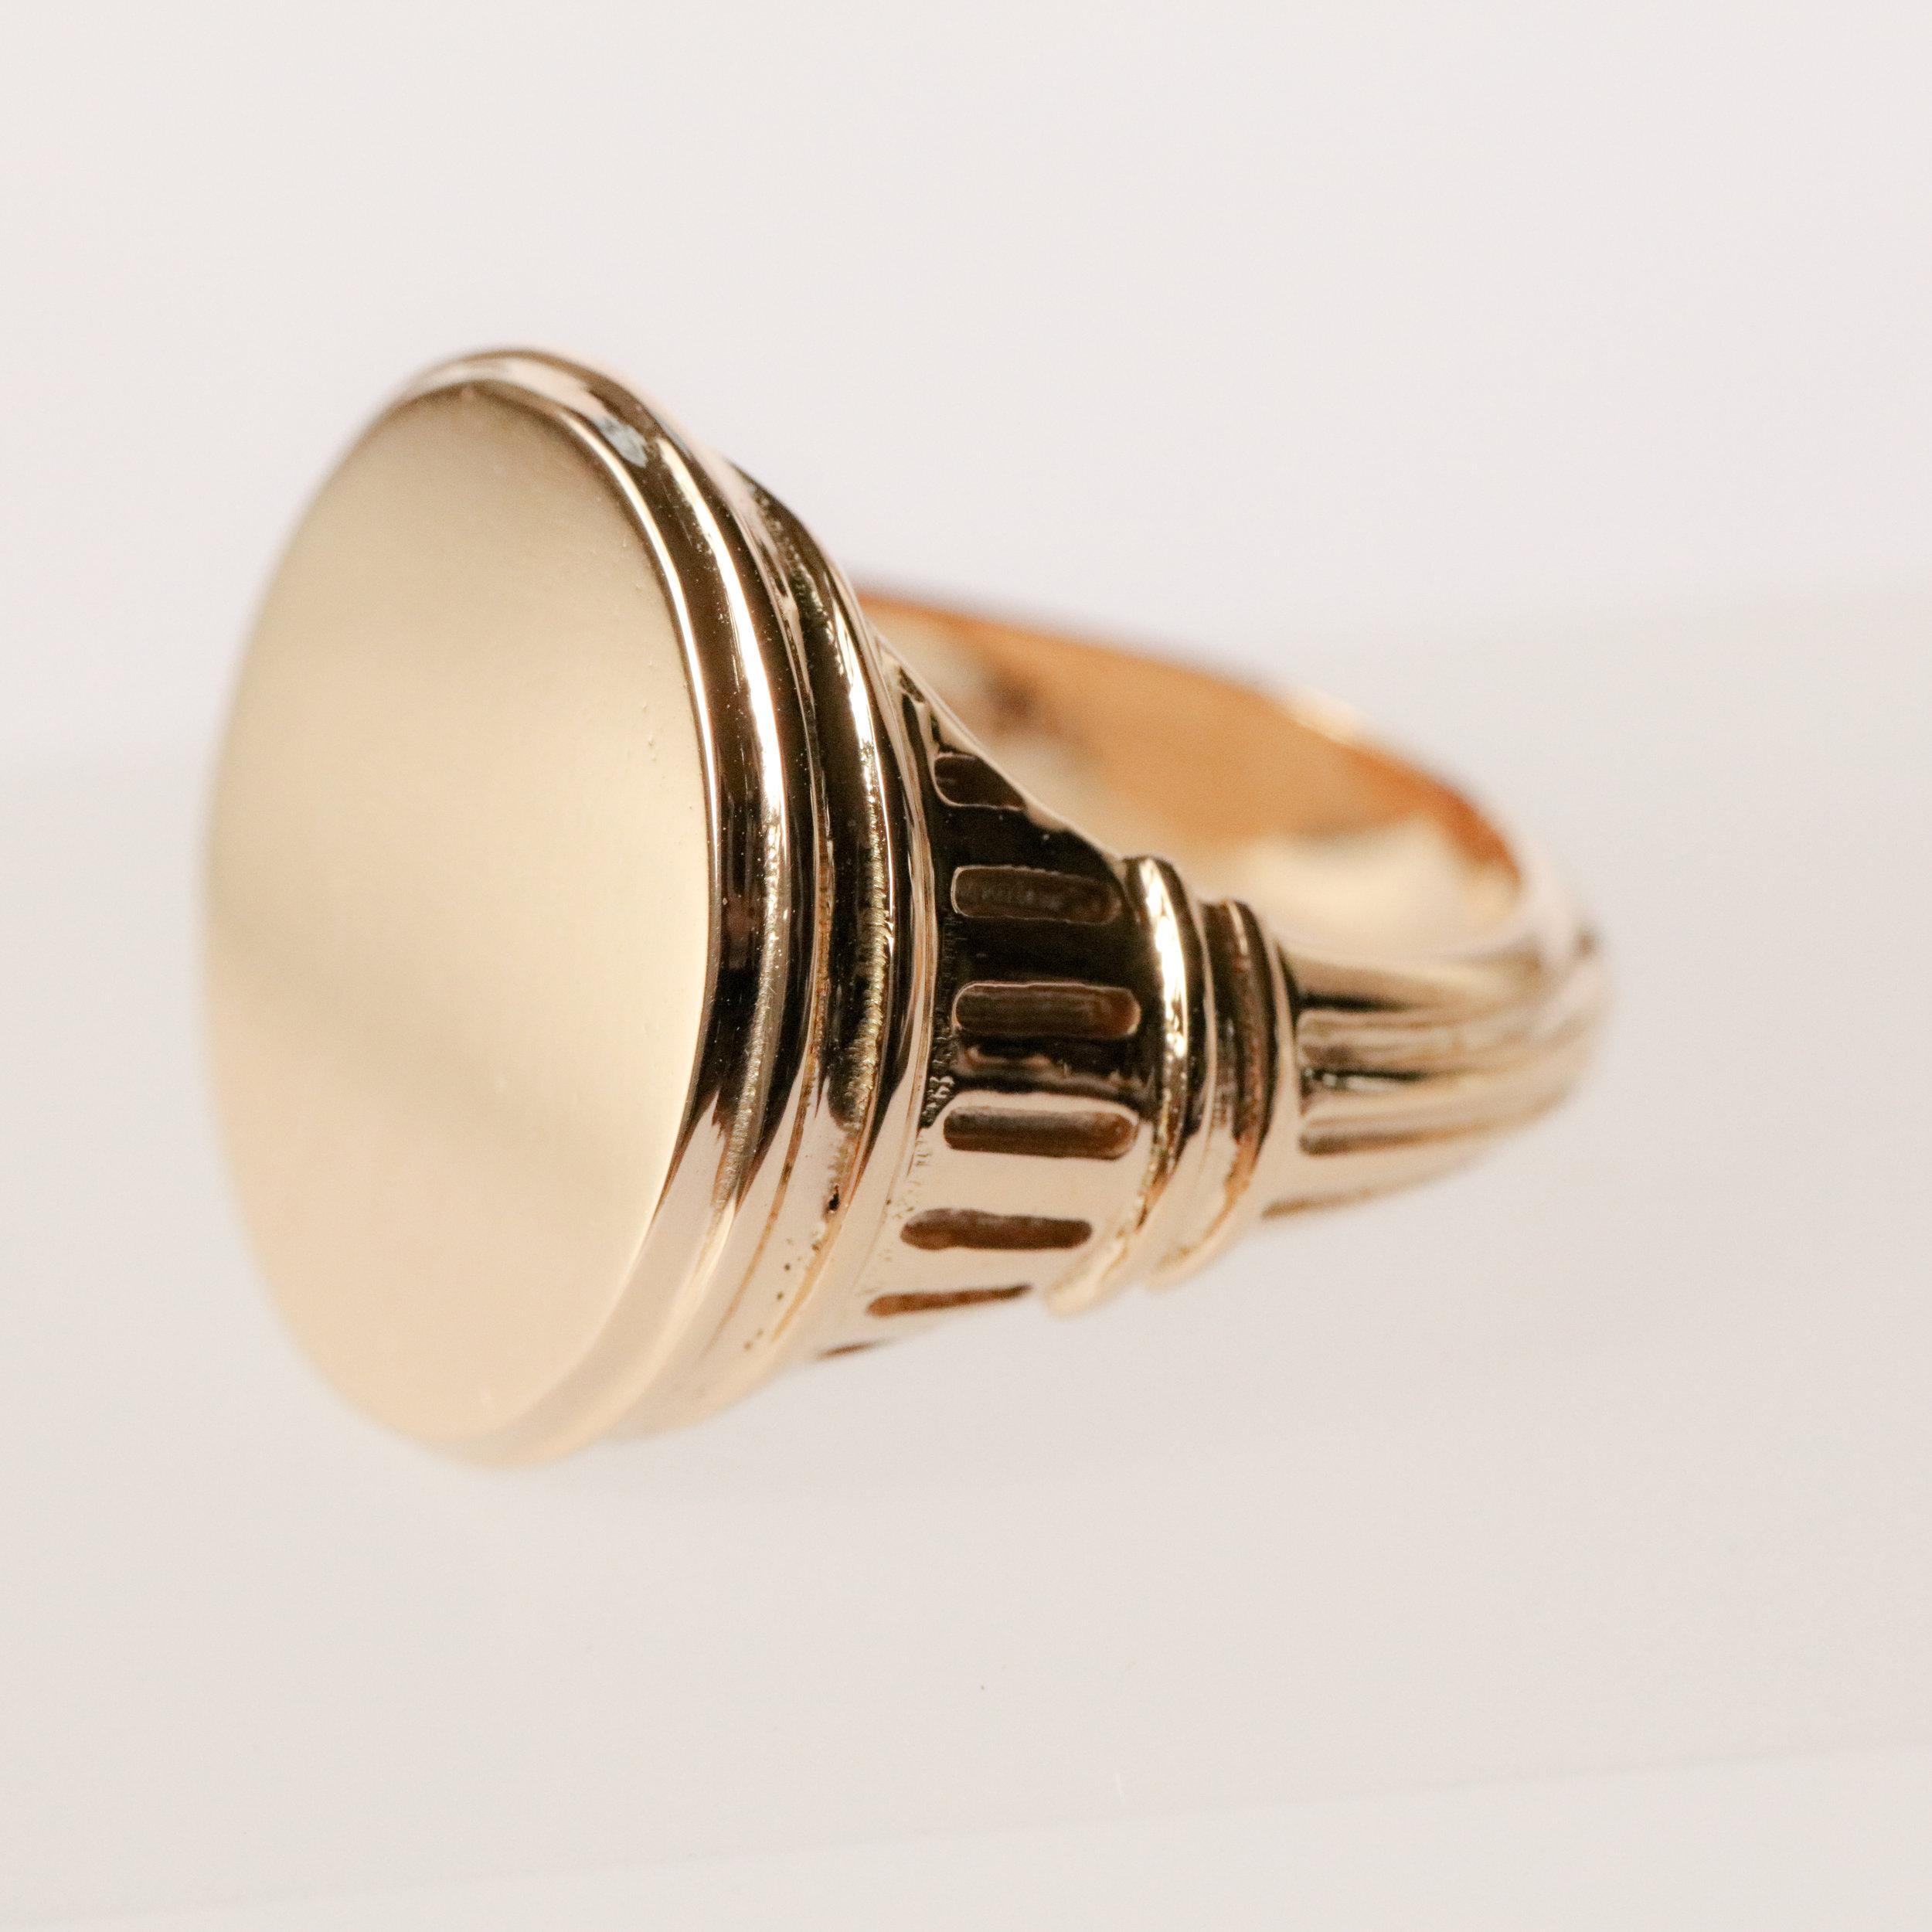 Marerro Signet Ring in 18ct yellow gold